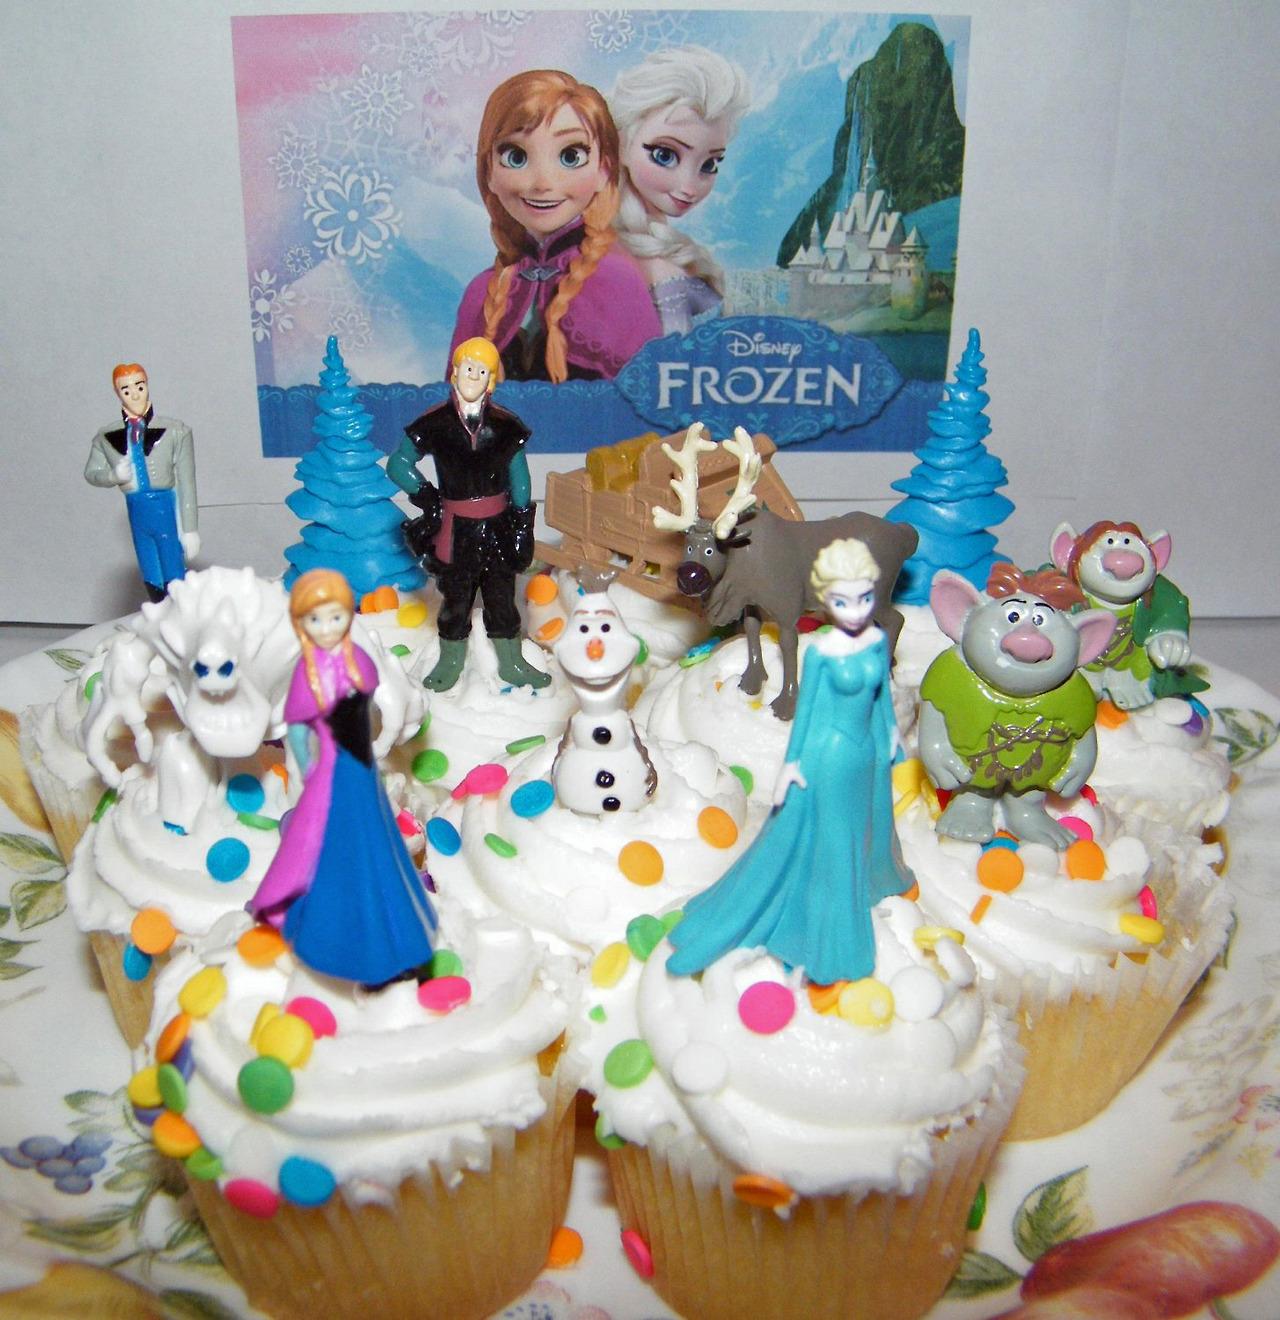 Cake Decorating Frozen Movie : Frozen Cake Toppers - Frozen Photo (35792278) - Fanpop